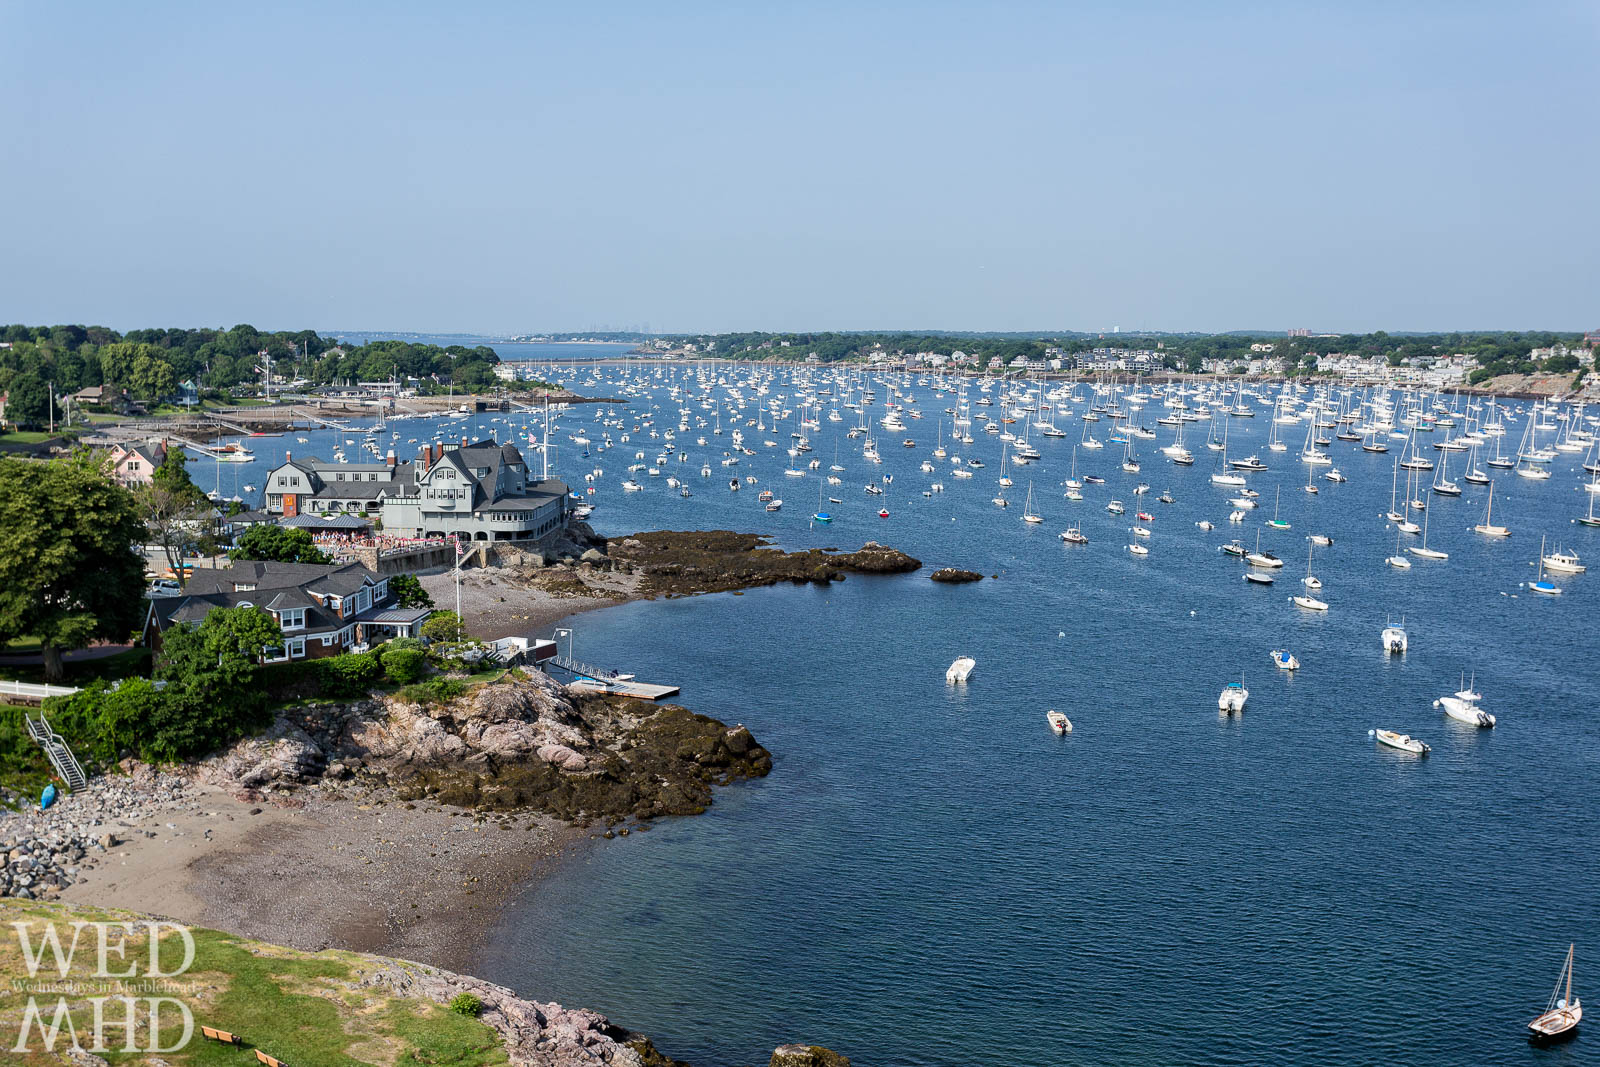 Corinthian Yacht Club And Marblehead Harbor